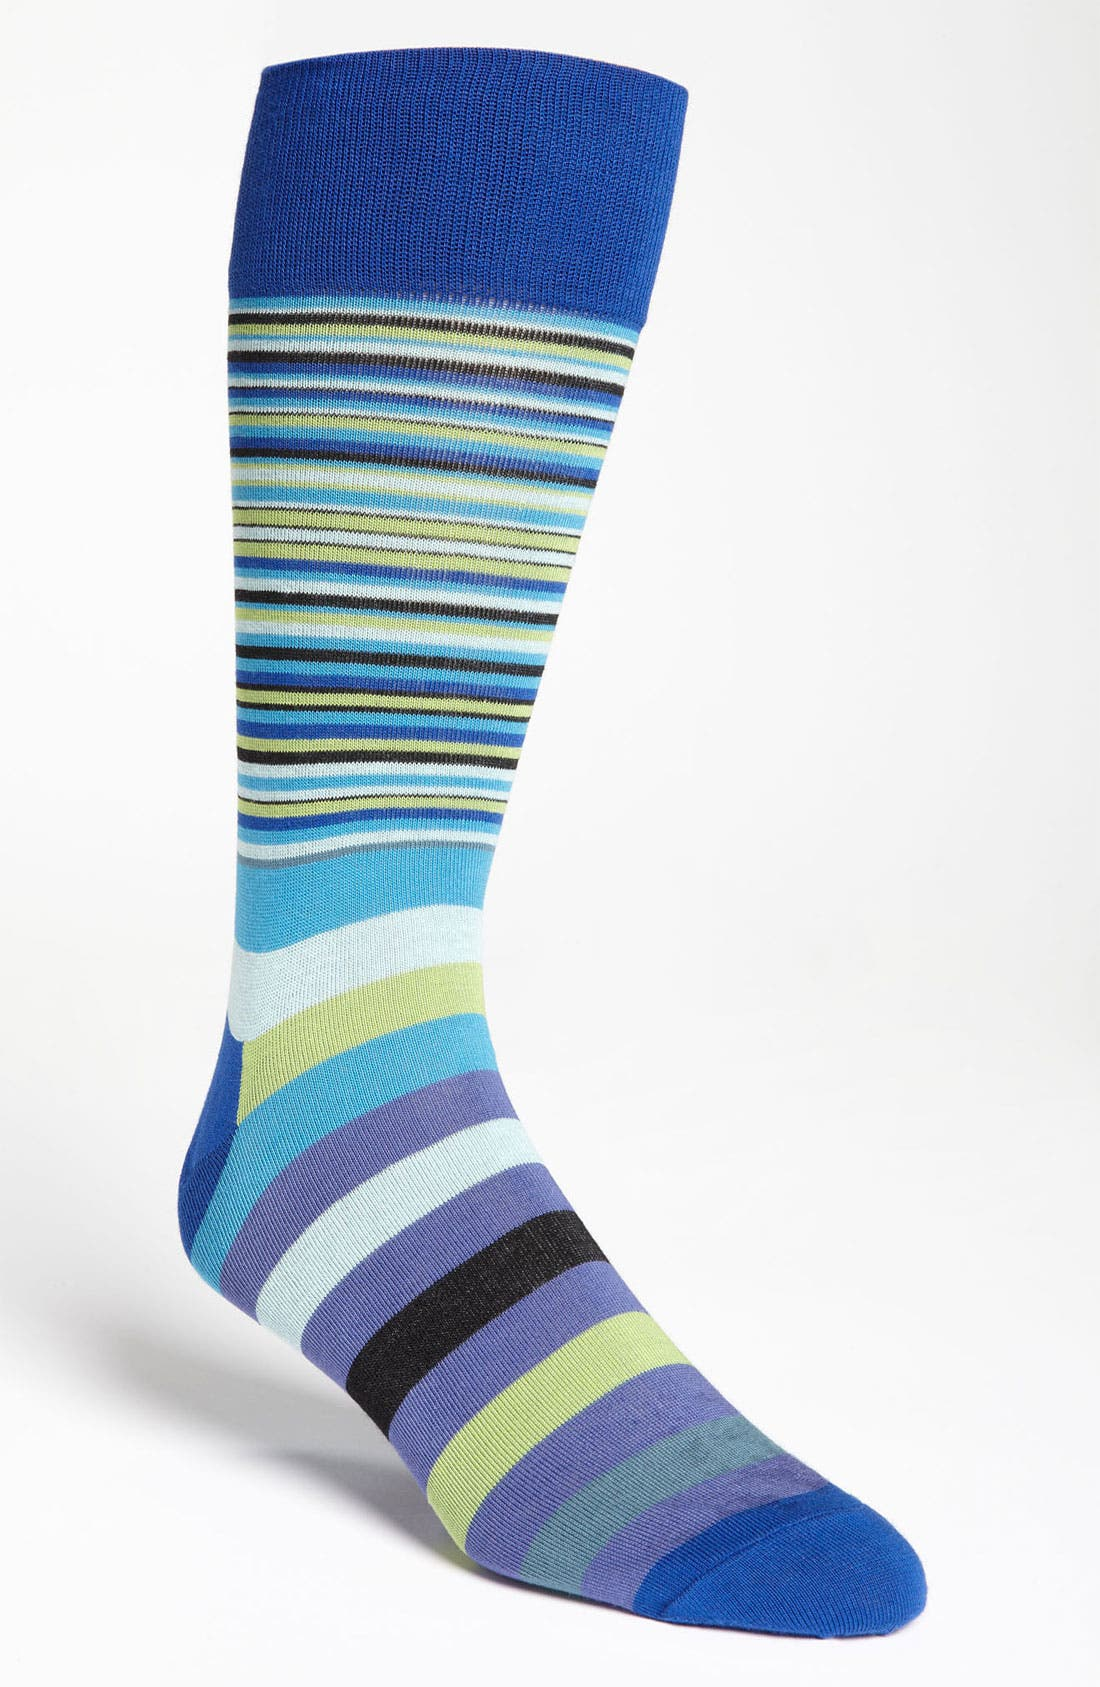 Alternate Image 1 Selected - Cole Haan 'Town Stripe' Crew Socks